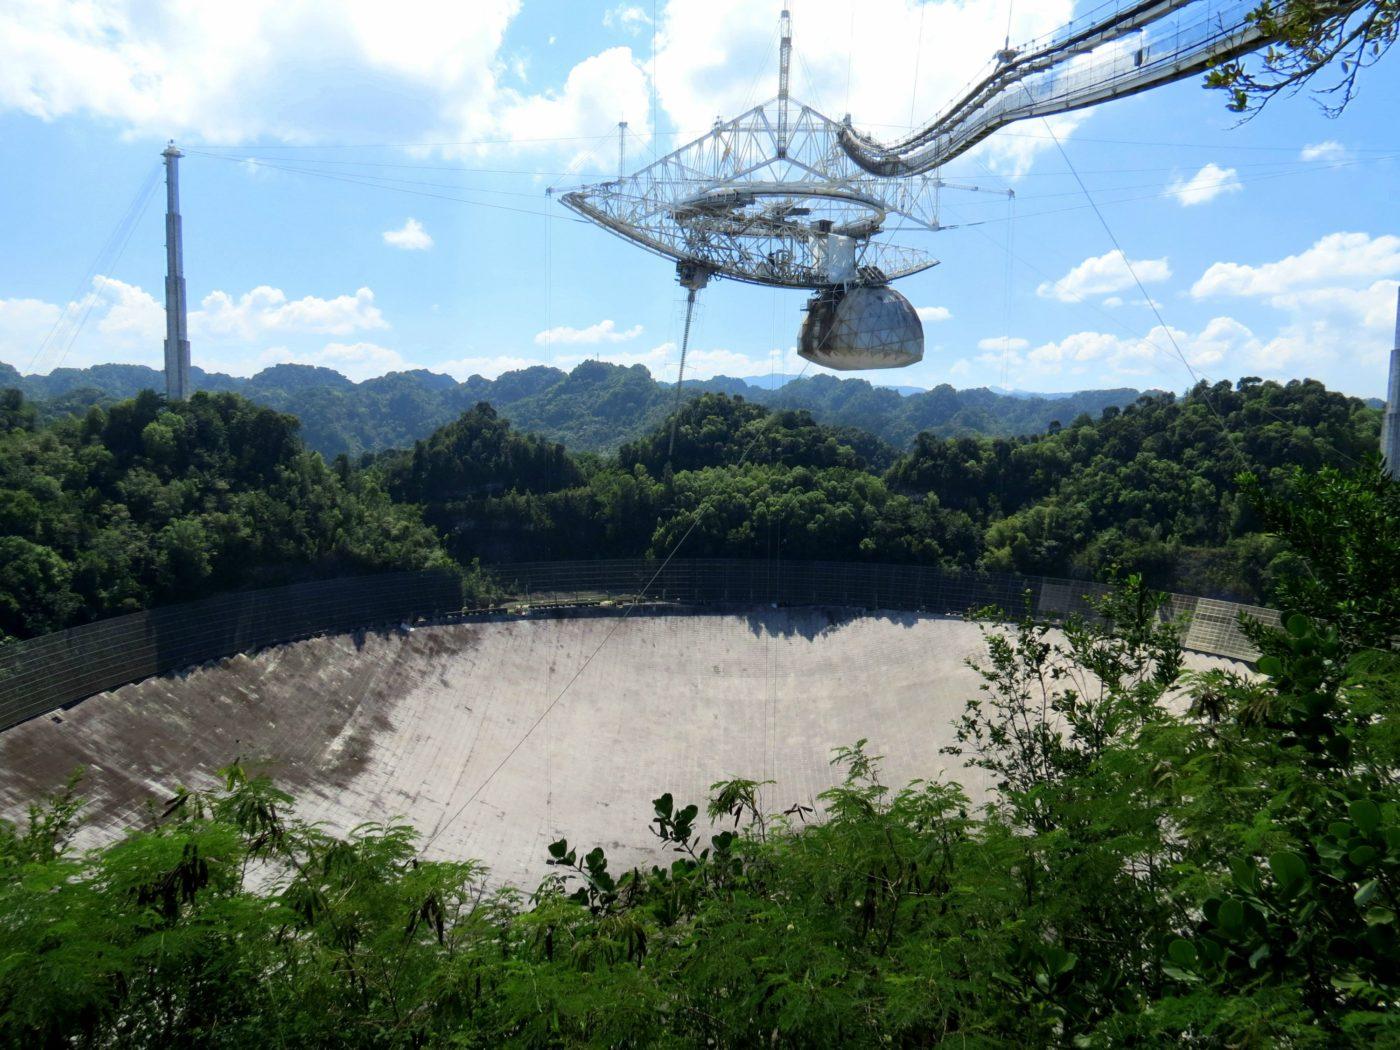 Rogue Transmission Arecibo Observatory